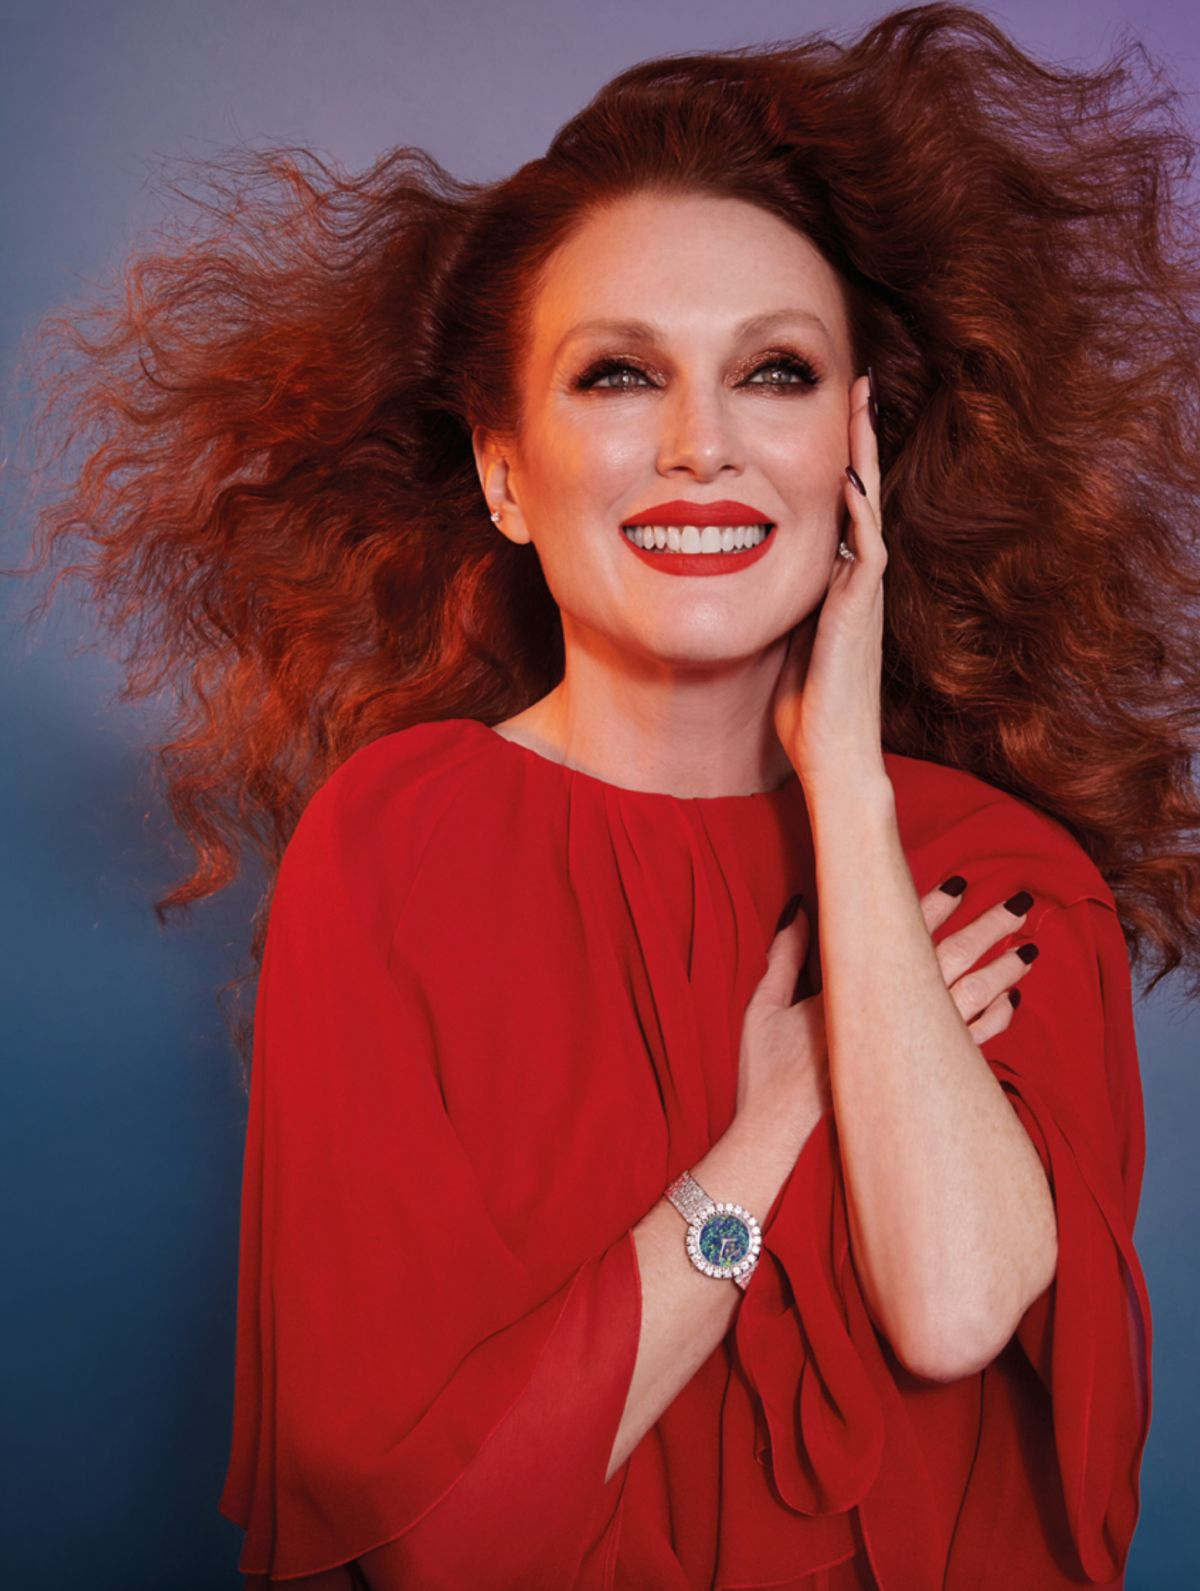 JULIANNE MOORE in L'Officiel Magazine, Italy February 2020 ...